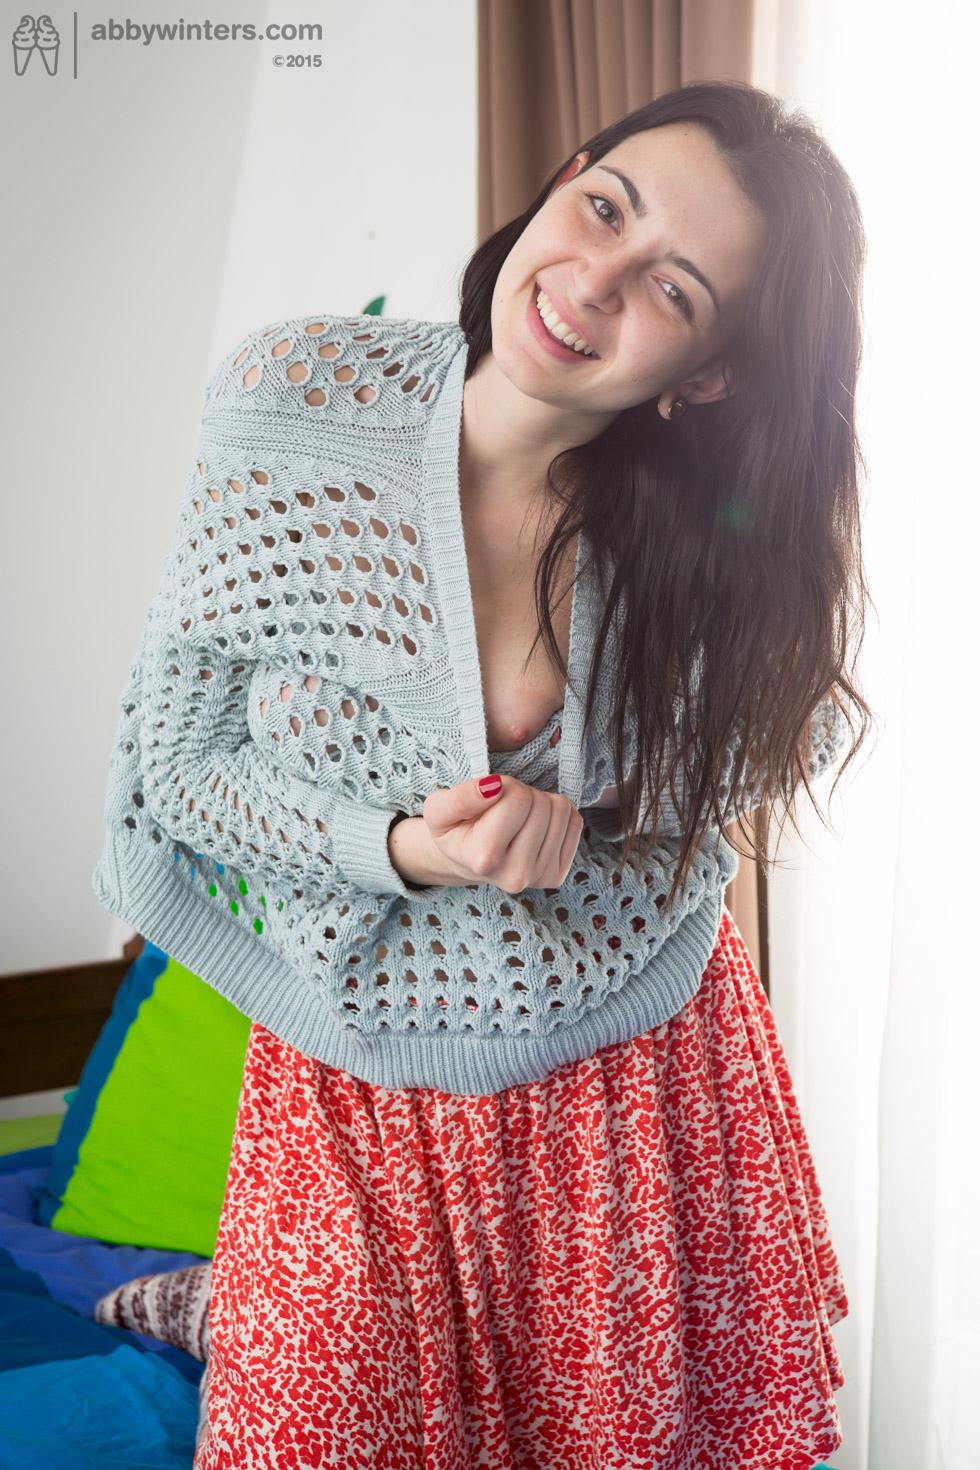 Carmen M in Bedroom Pleasures by Abby Winters 16 photos